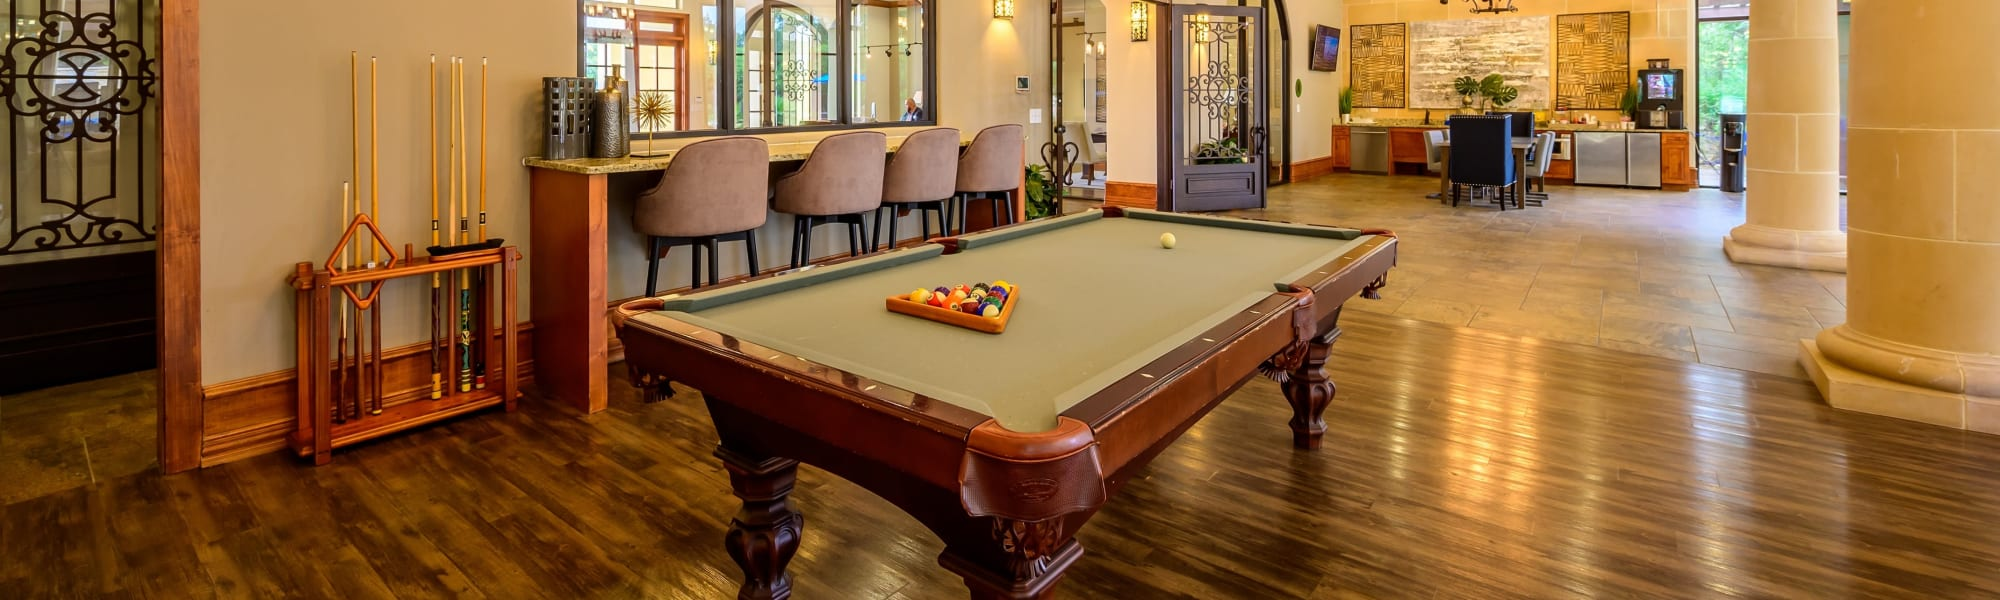 Virtual tours of Pecan Springs Apartments in San Antonio, Texas